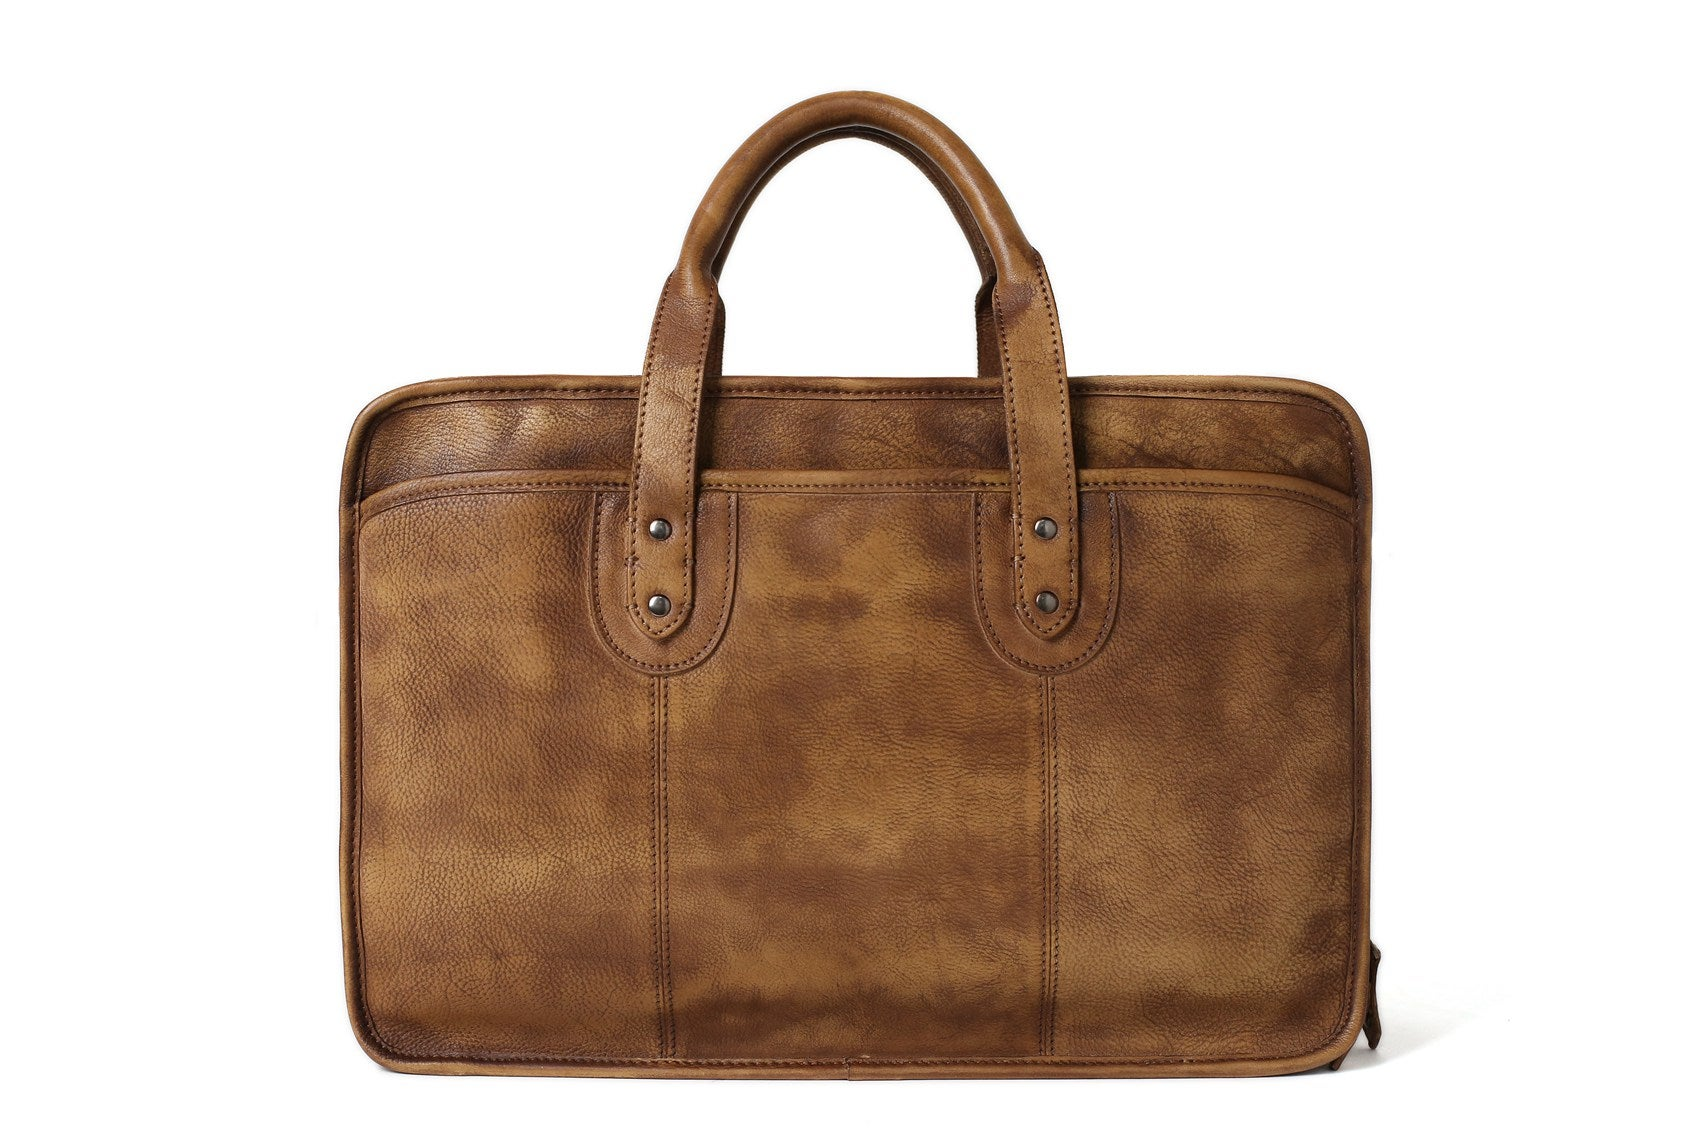 Handmade Vintage Full Grain Leather Mens Briefcase 16 Laptop Bag Business Handbag Nz01